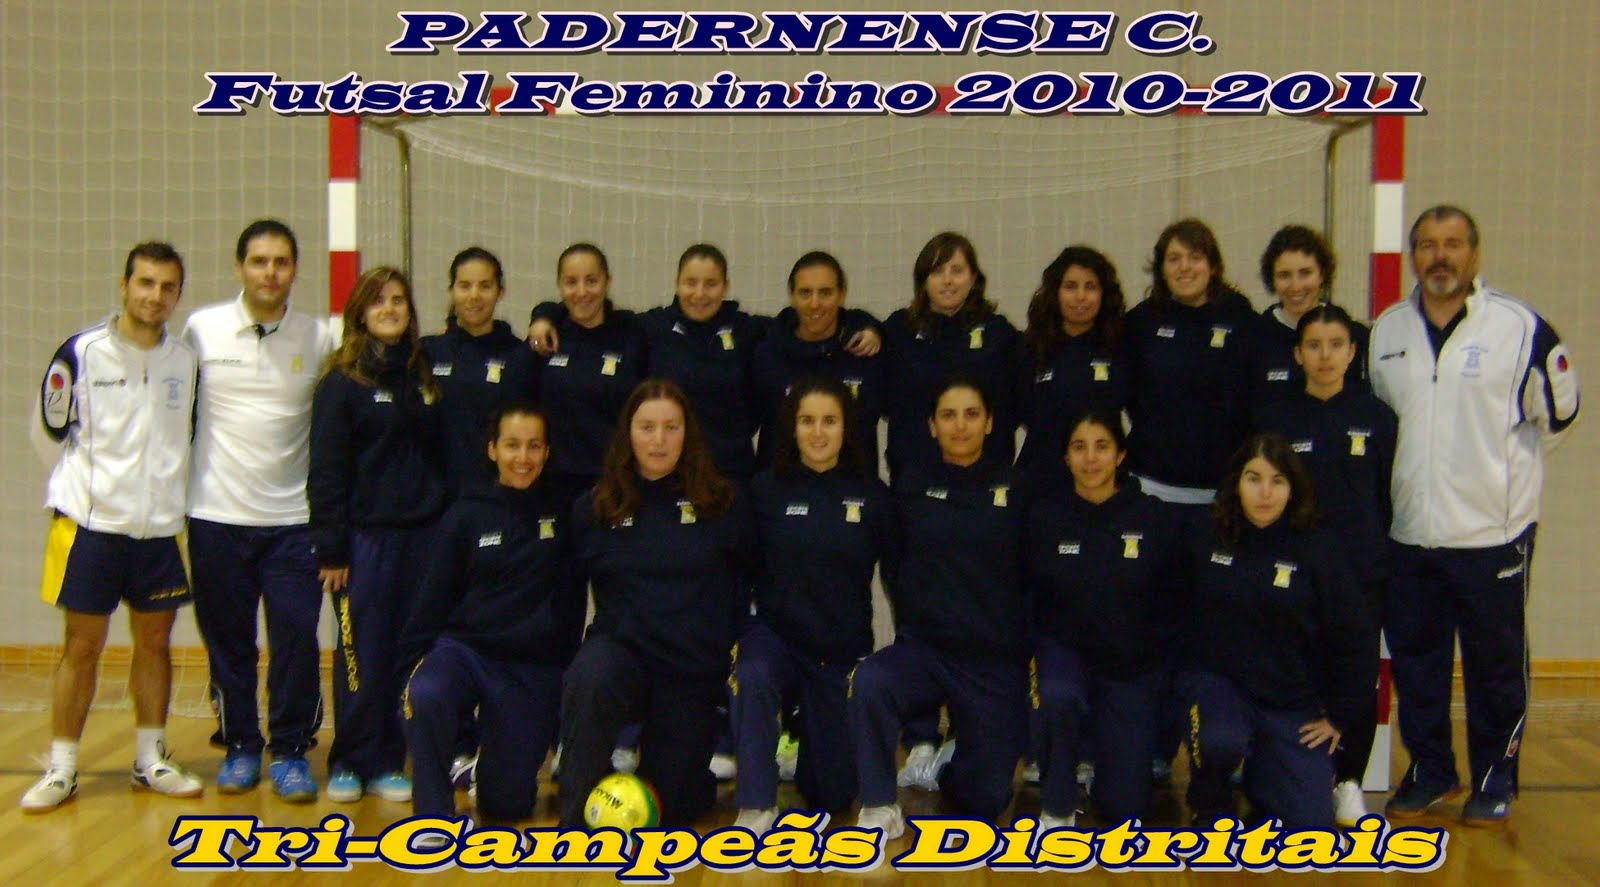 3a4da68585 Padernense C sagrou-se TRI-CAMPEÃ Distrital de Futsal Feminino 2010 2011